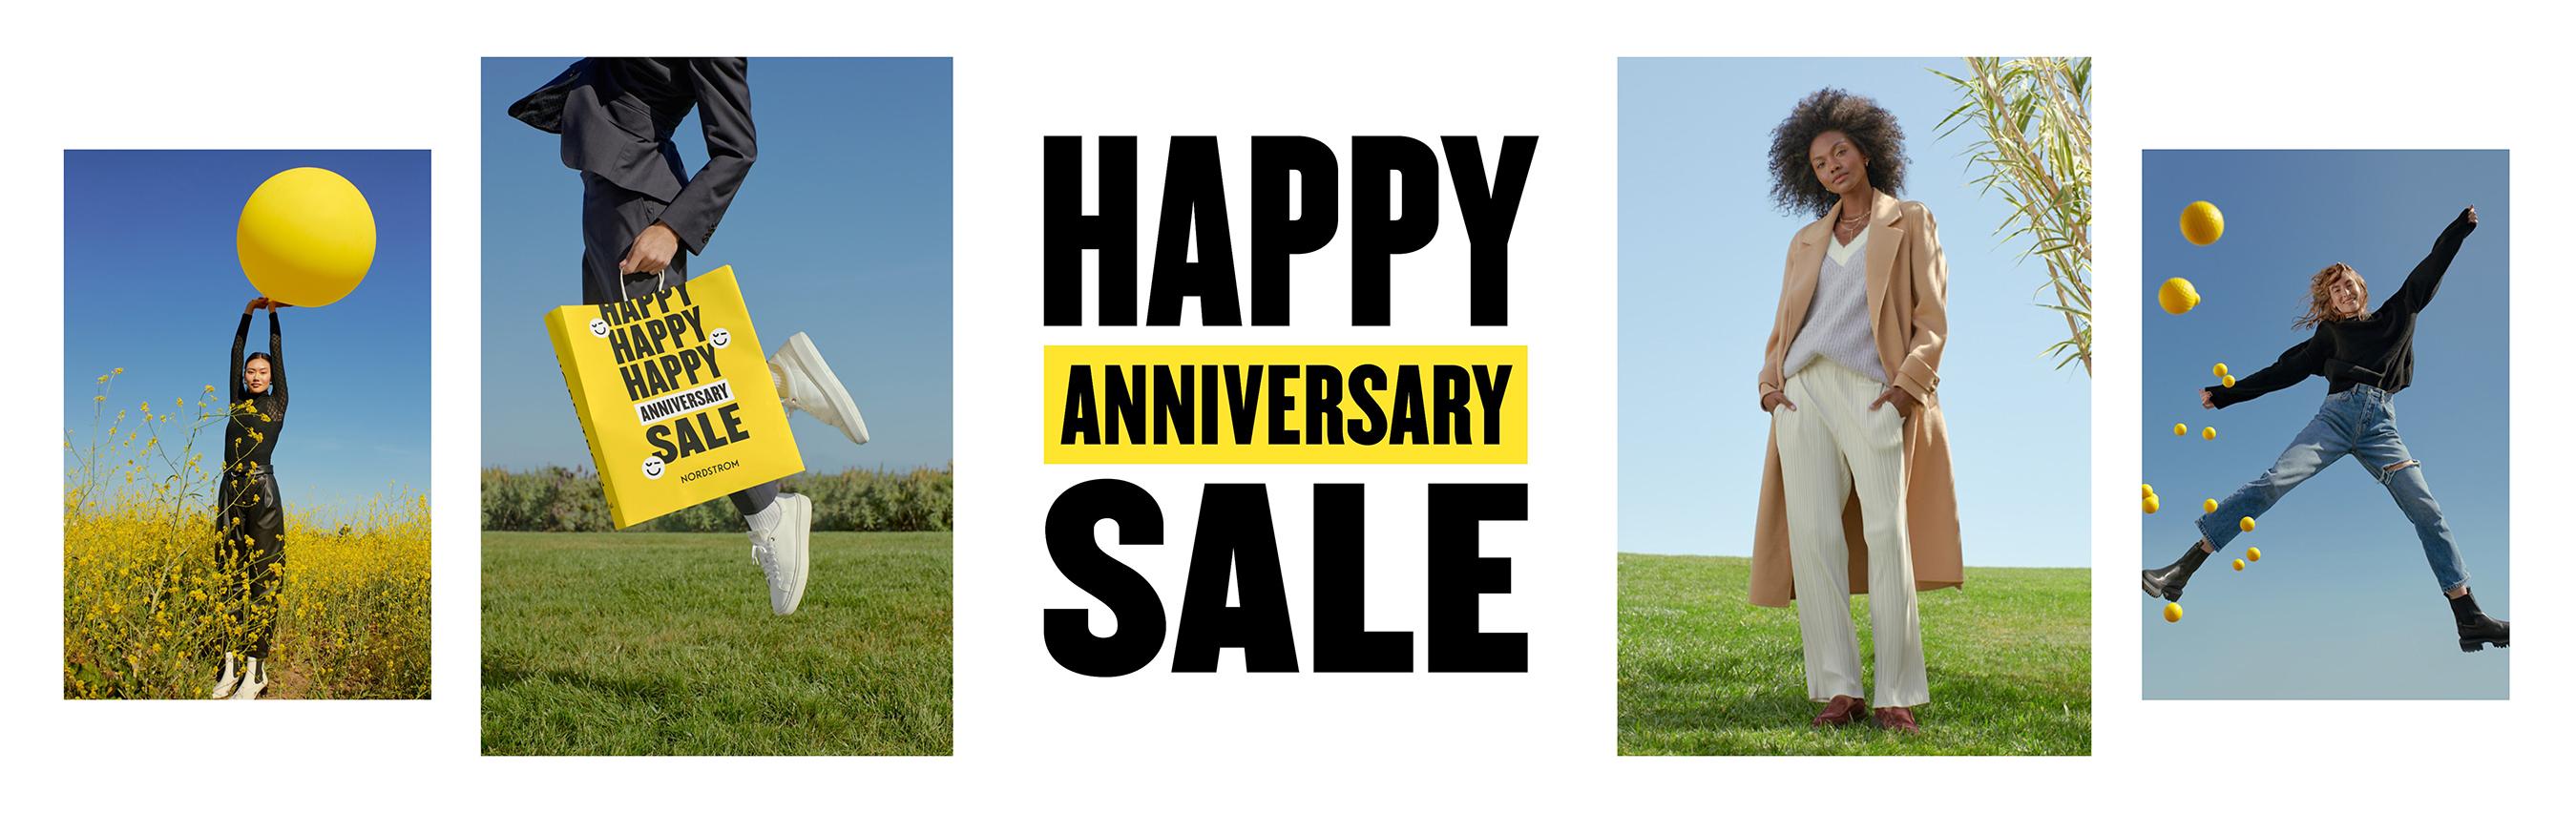 Nordstrom 2021 Anniversary Sale